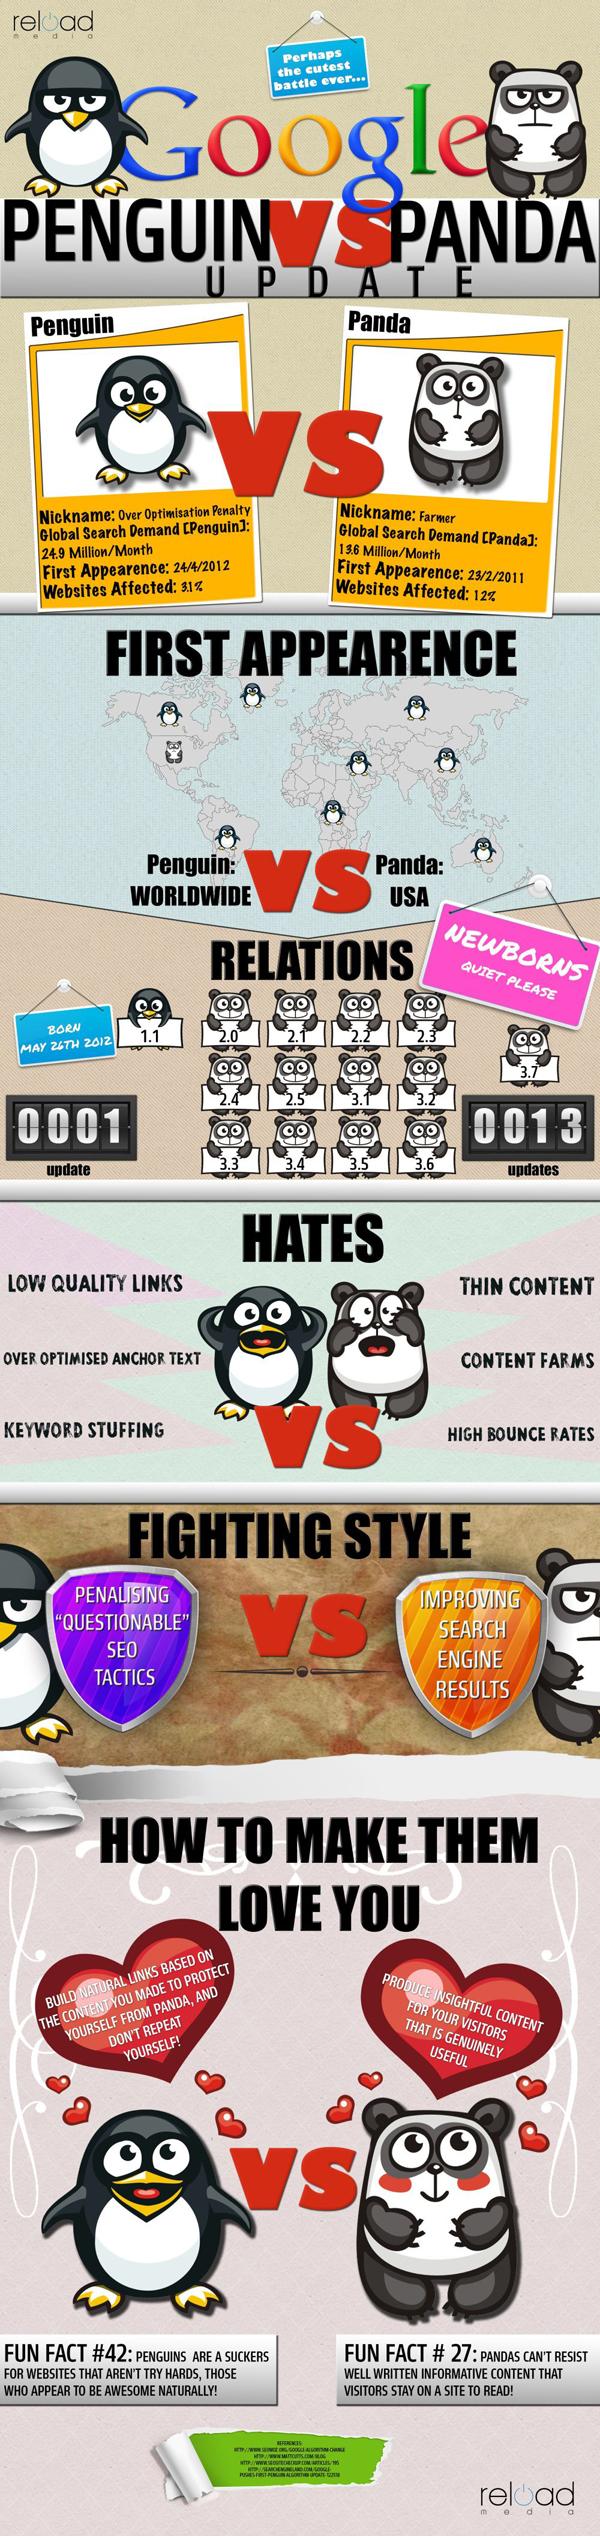 panda-vs-penguin-infographic